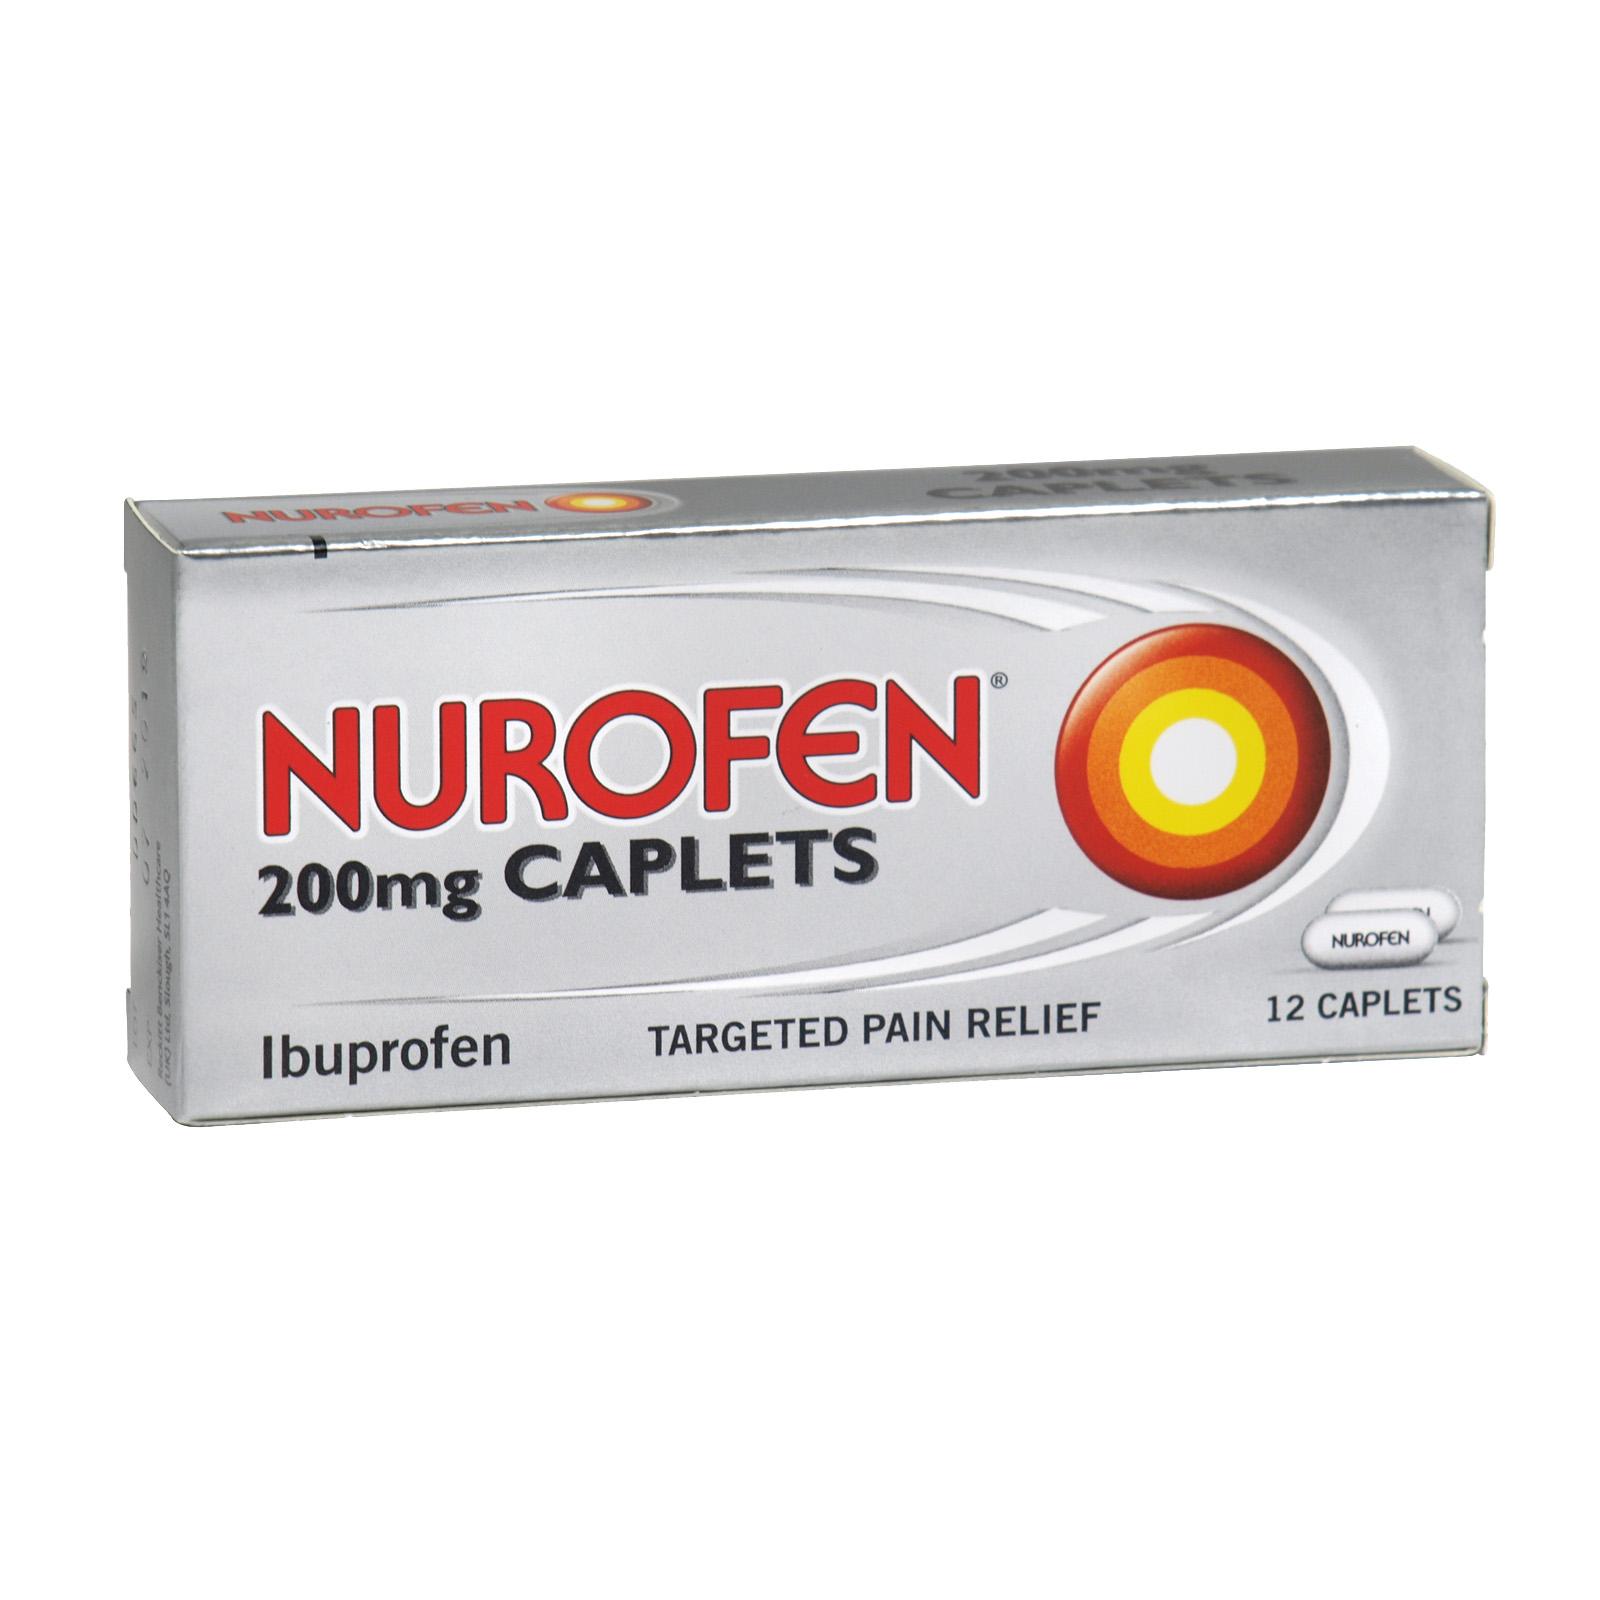 NUROFEN CAPLETS 12X200MG X12 (NON RETURNABLE)